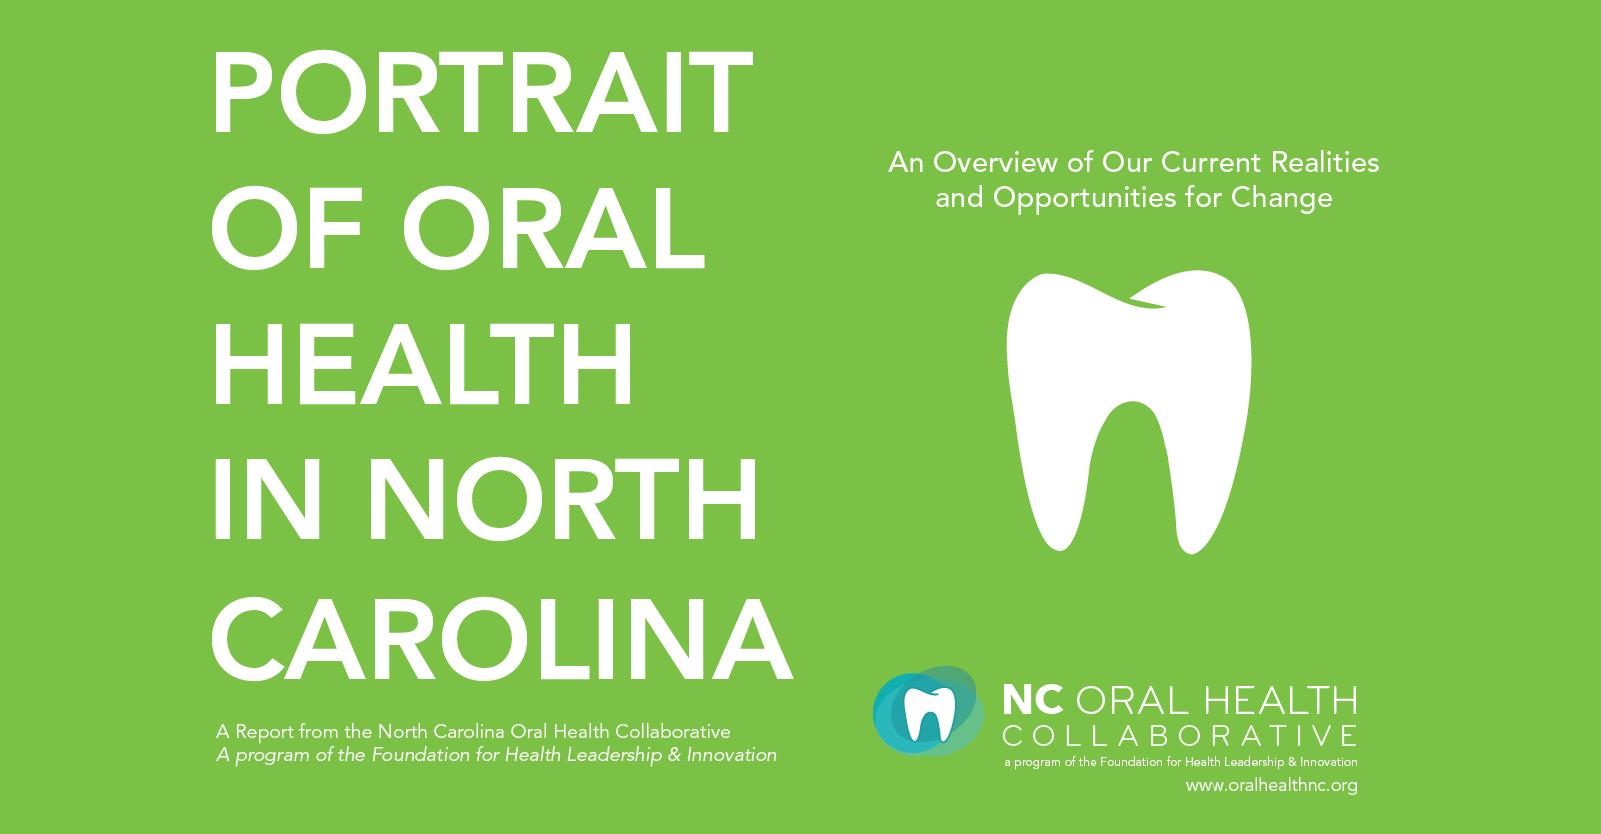 Portrait of Oral Health in North Carolina